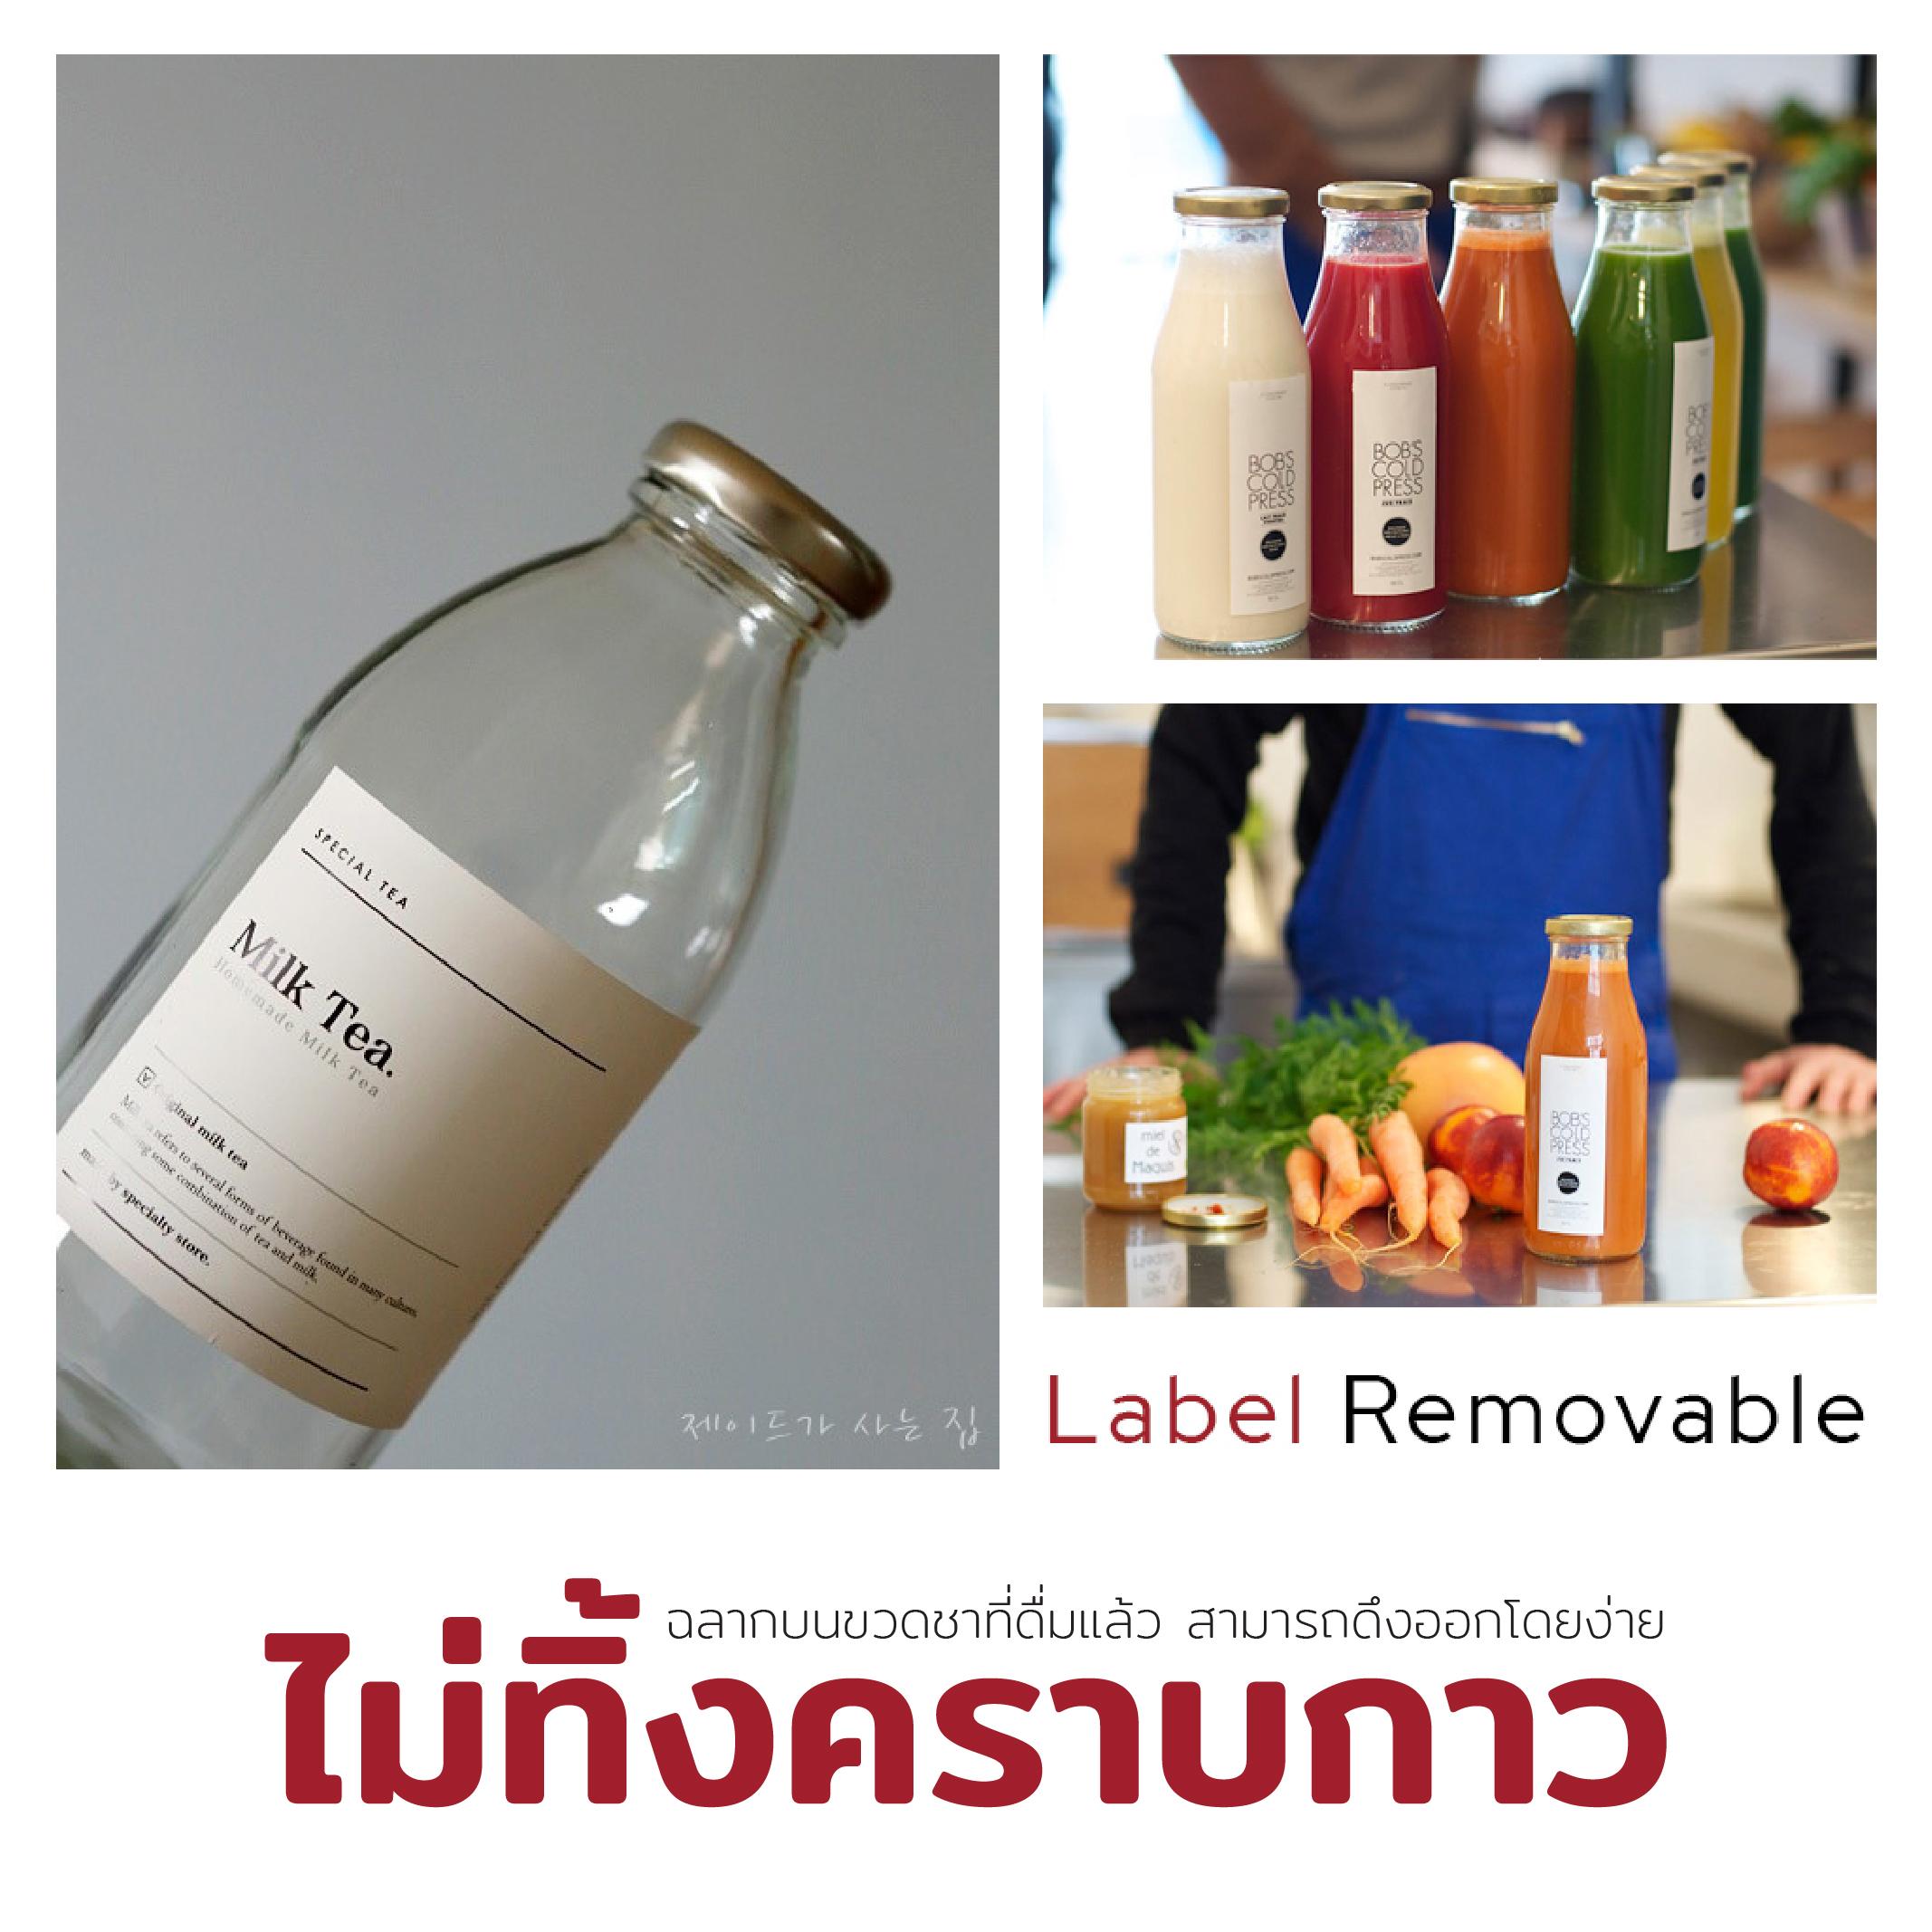 Label Removable